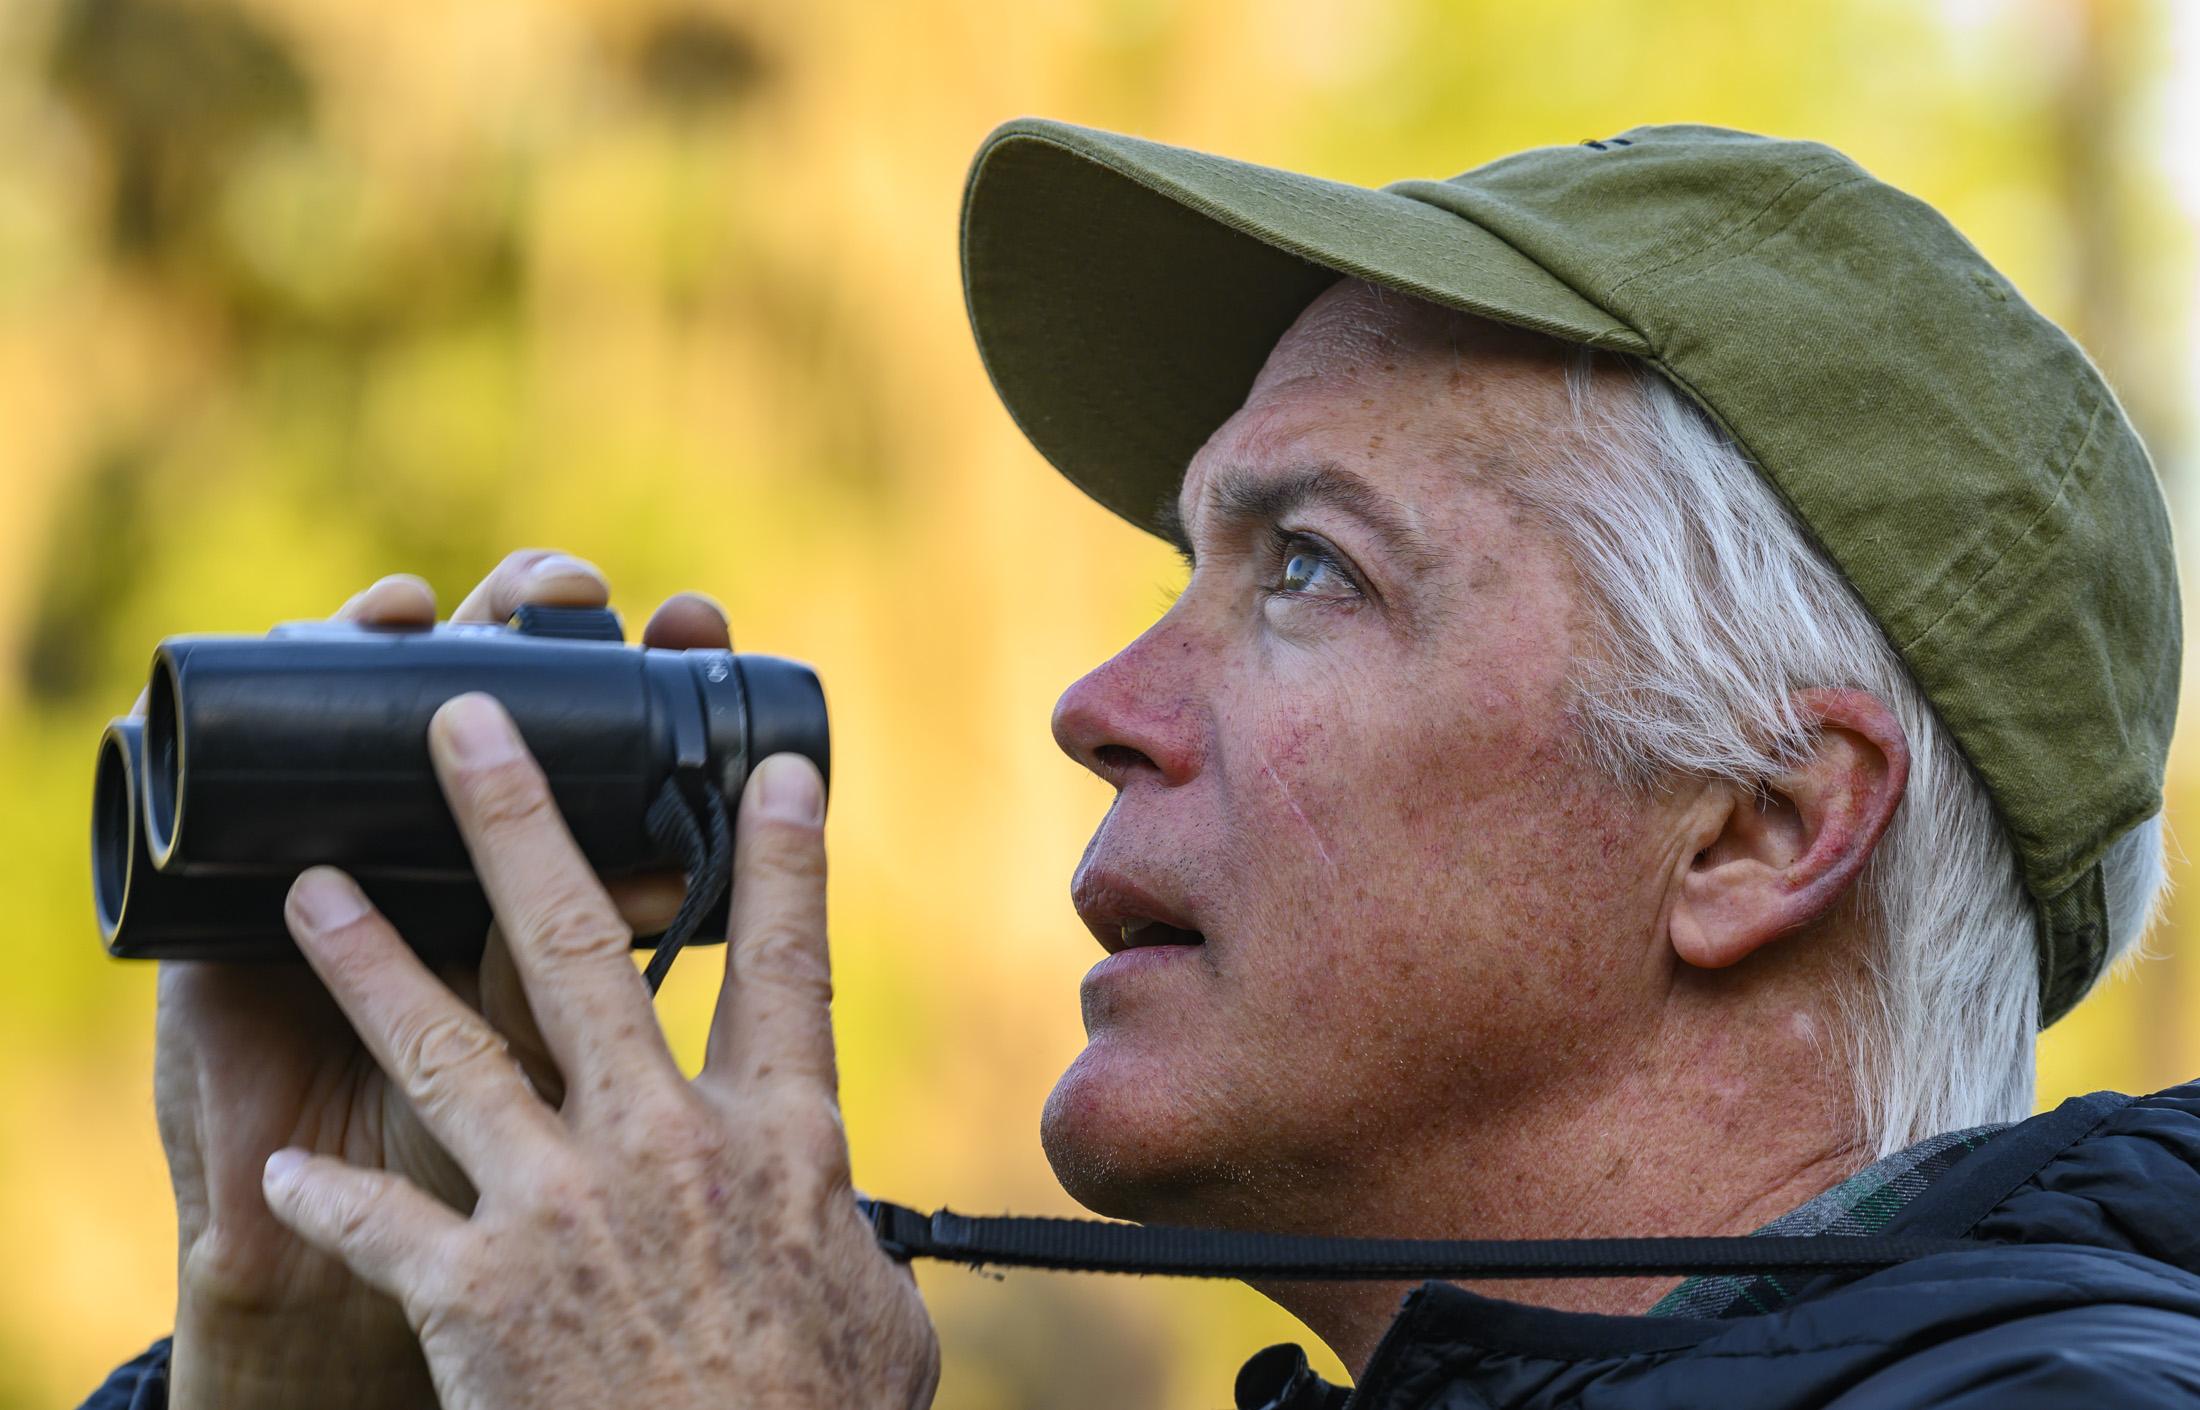 Adam Kent holding binoculars